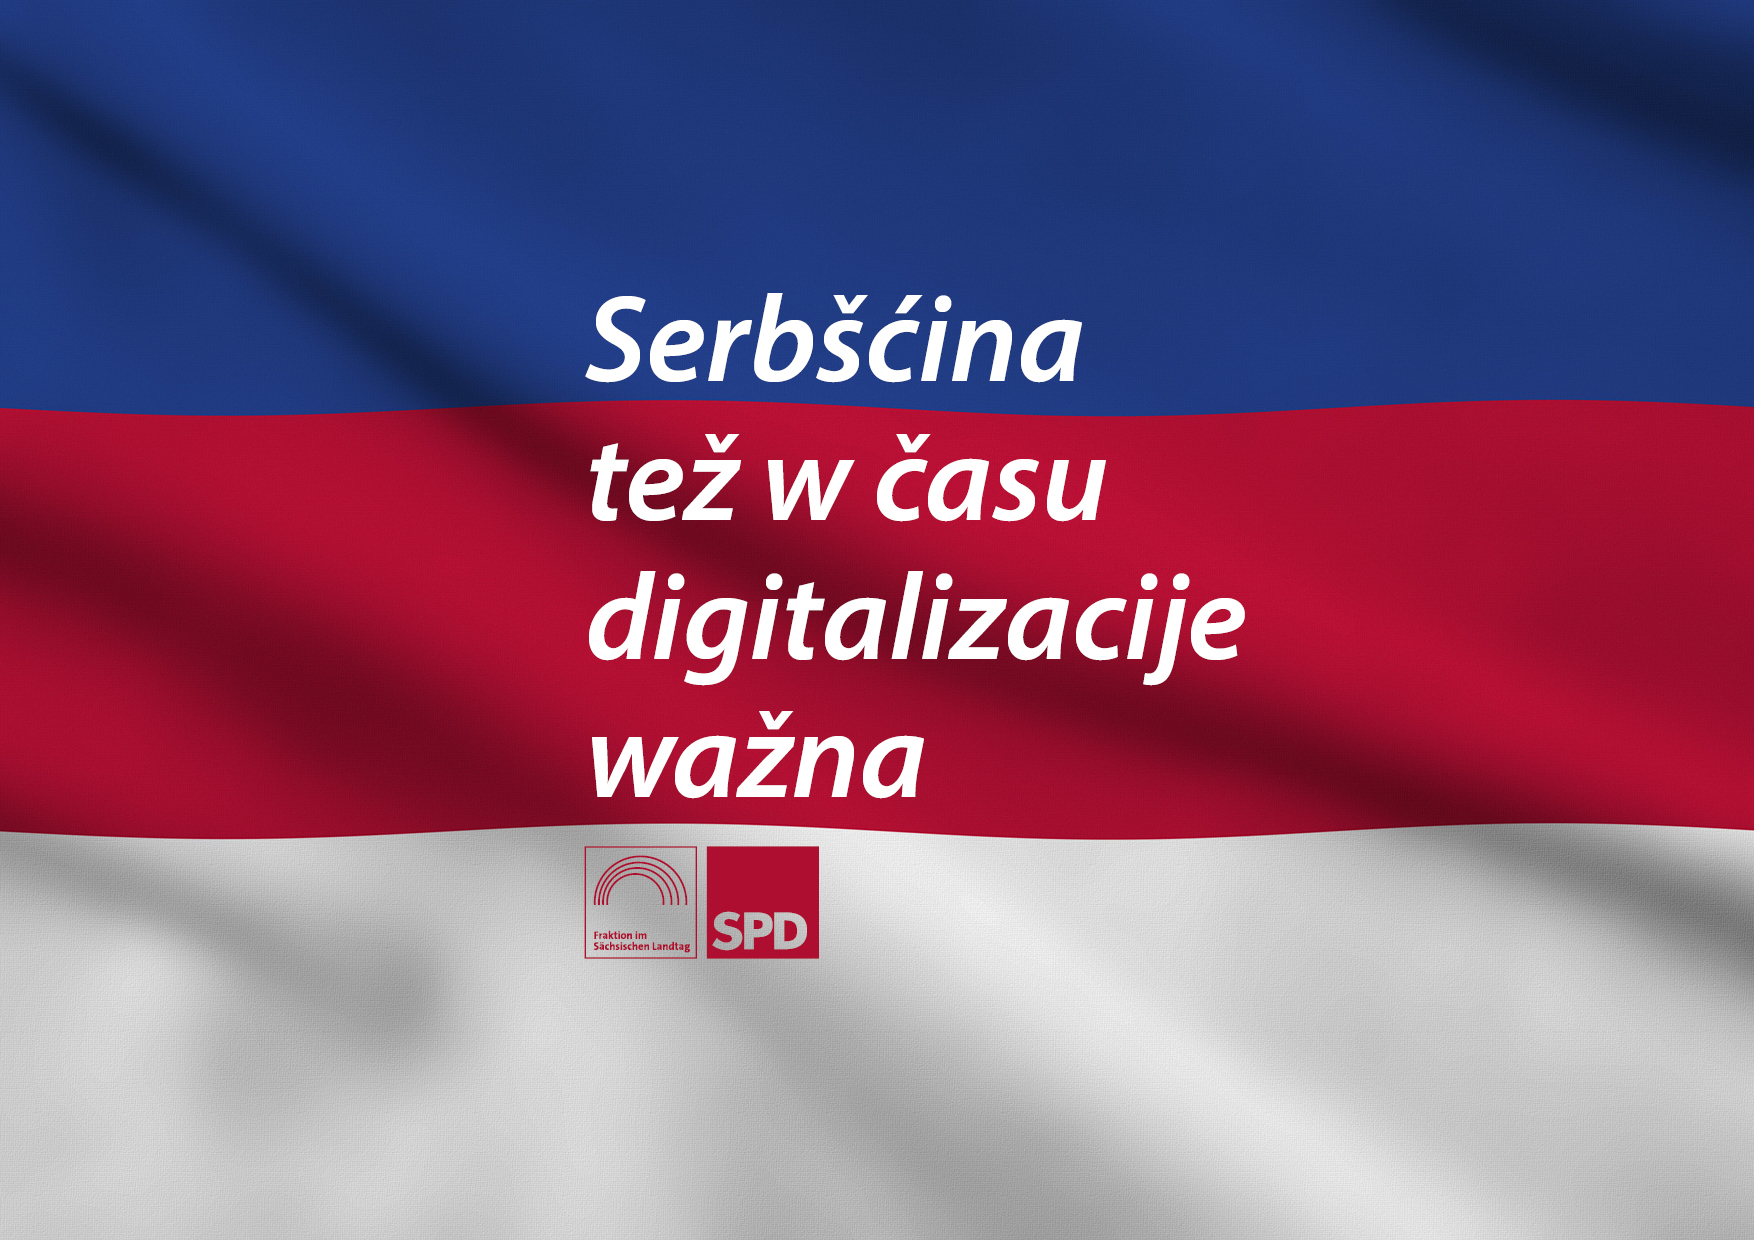 Sorbisch auch im Zeitalter der Digitalisierung wichtig – Serbšćina tež w času digitalizacije wažna